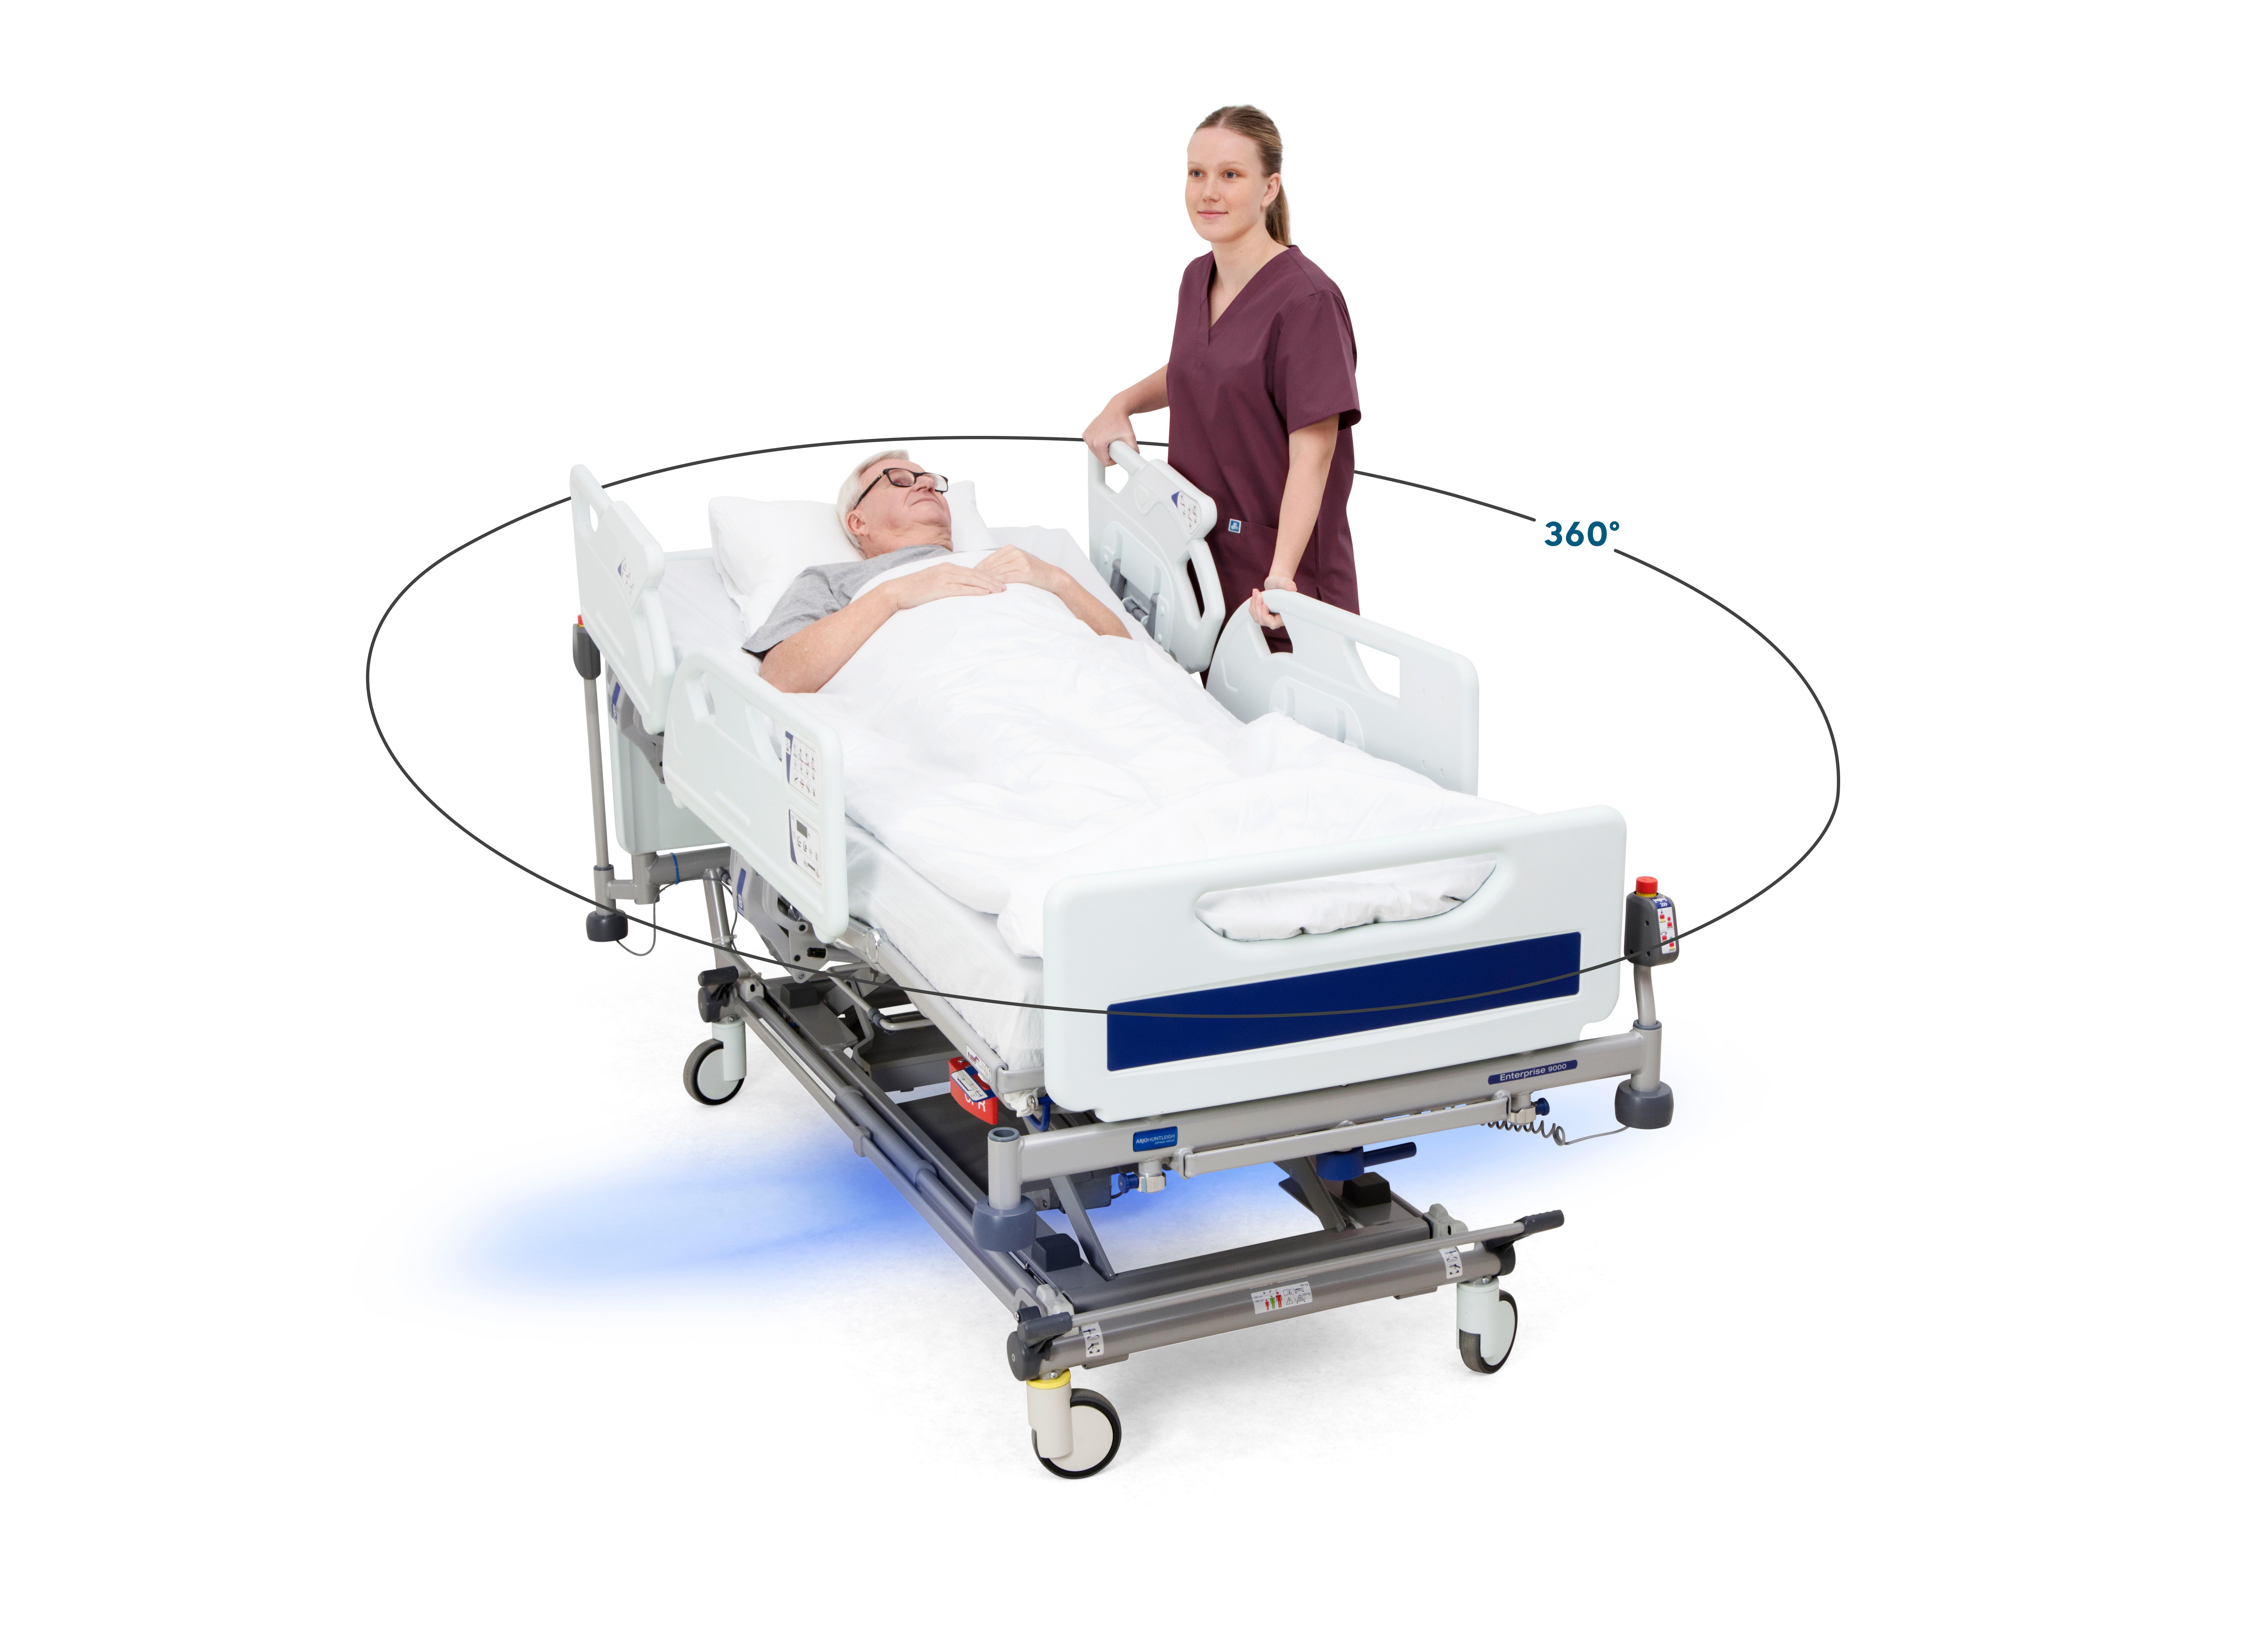 Arjo unveils IndiGo™breakthrough technology for medical bed transport